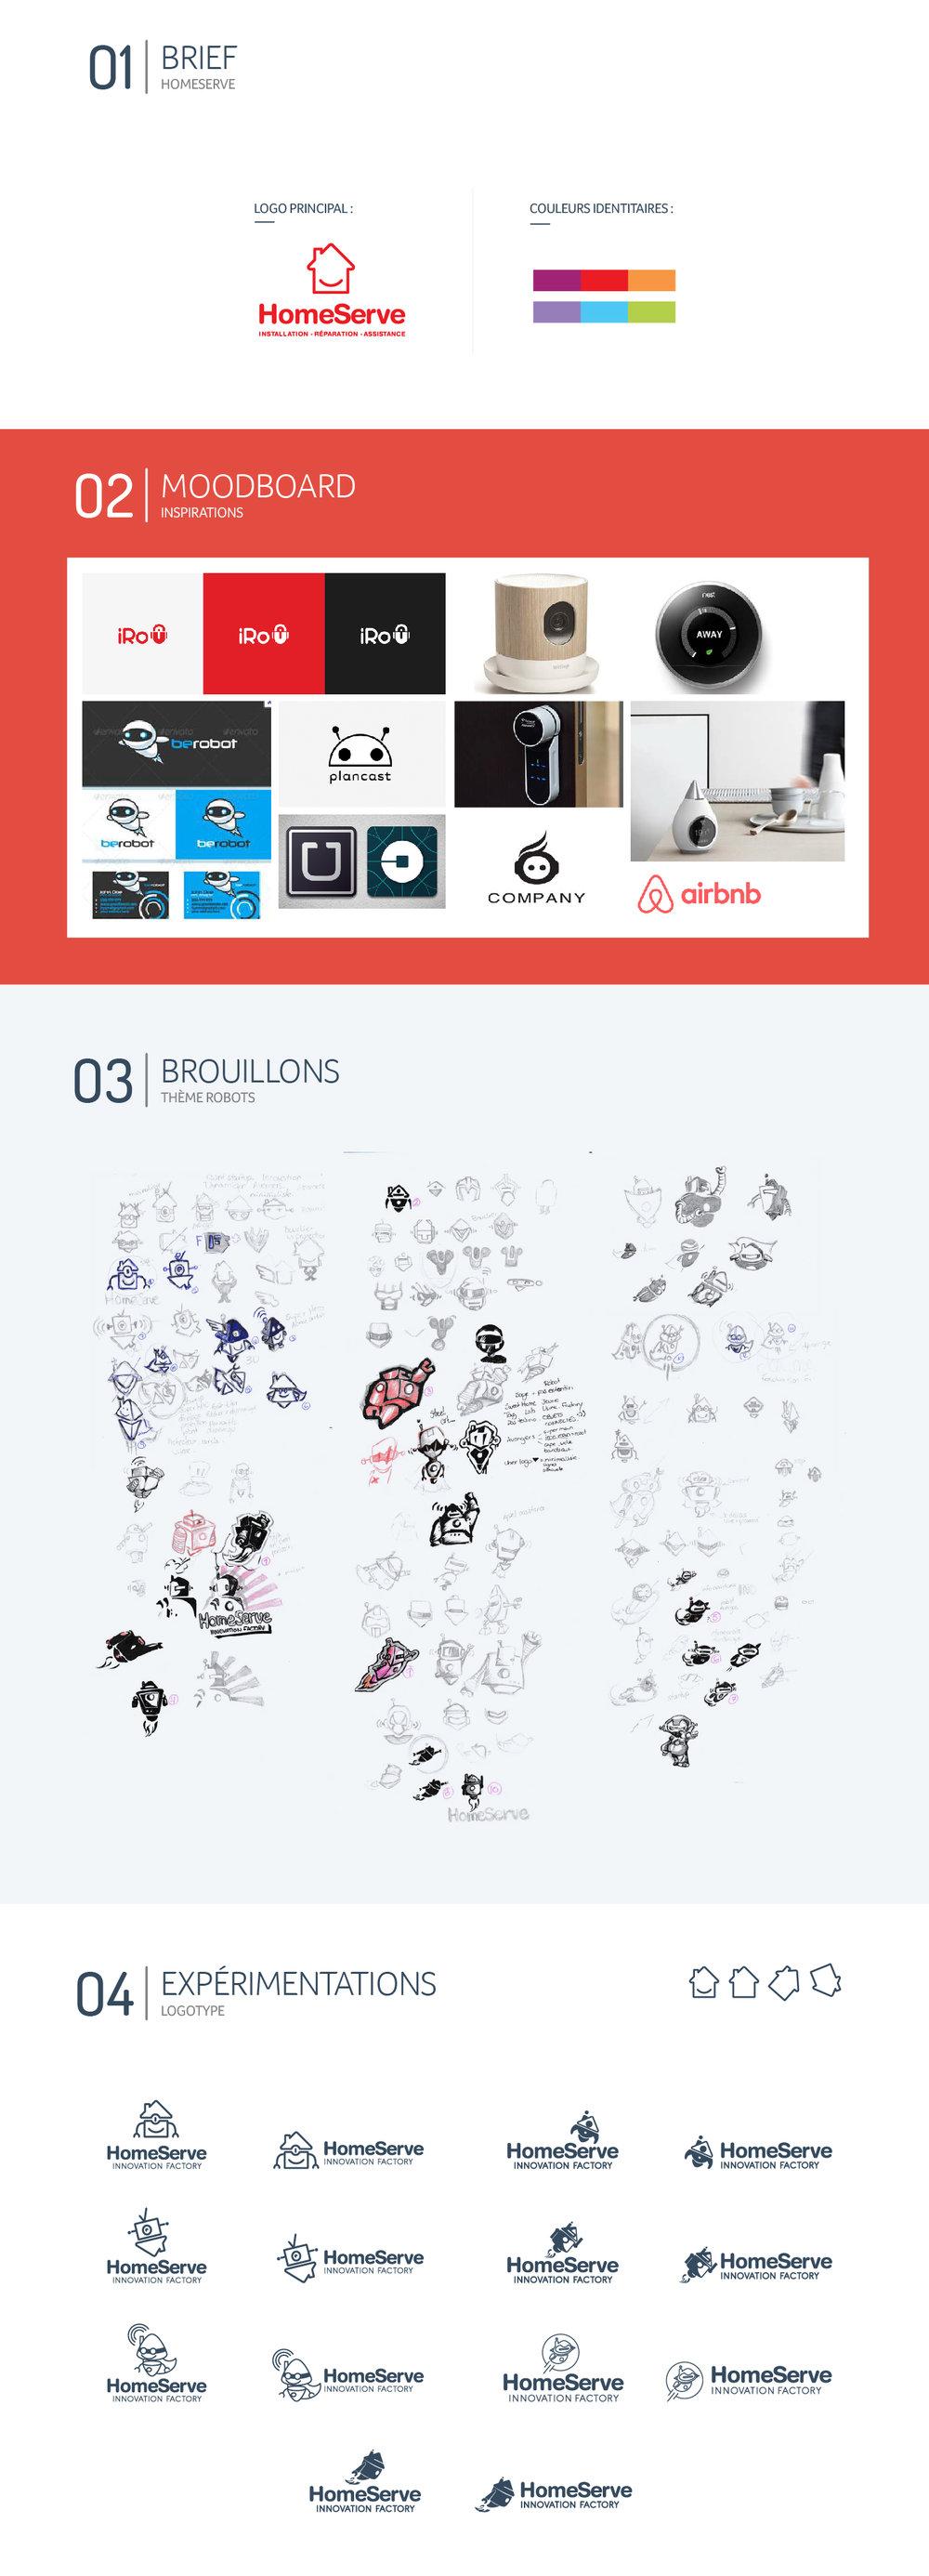 1-homeserve-innovation-factory-assurance_logotype_inspirations_experimentations.jpg